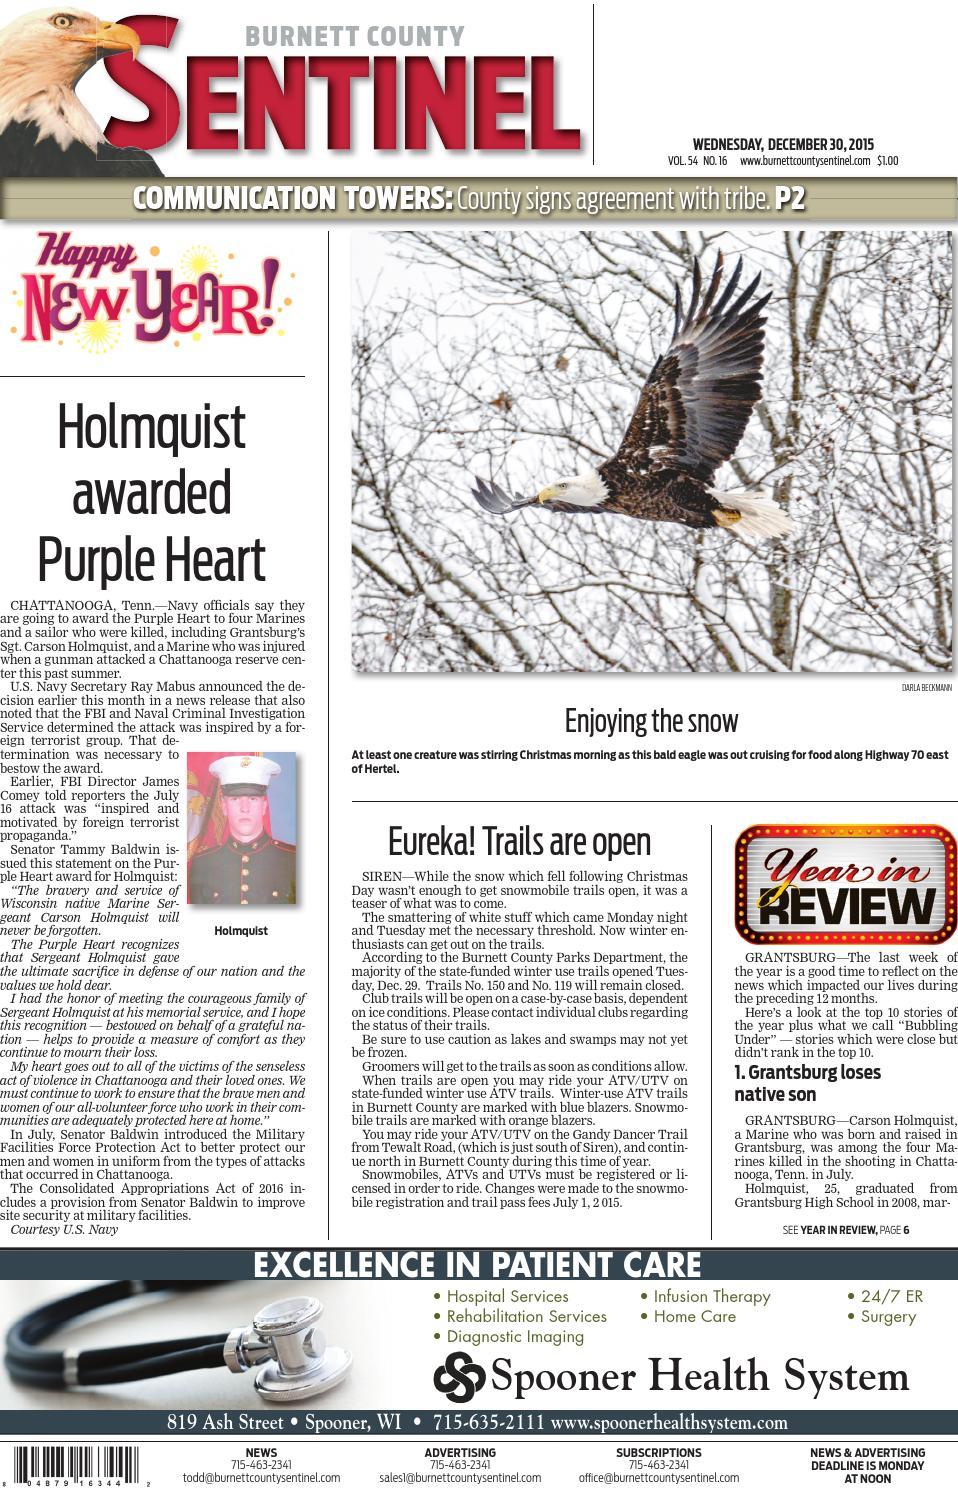 Burnett County Sentinel 12 30 15 By Burnett County Sentinel Issuu